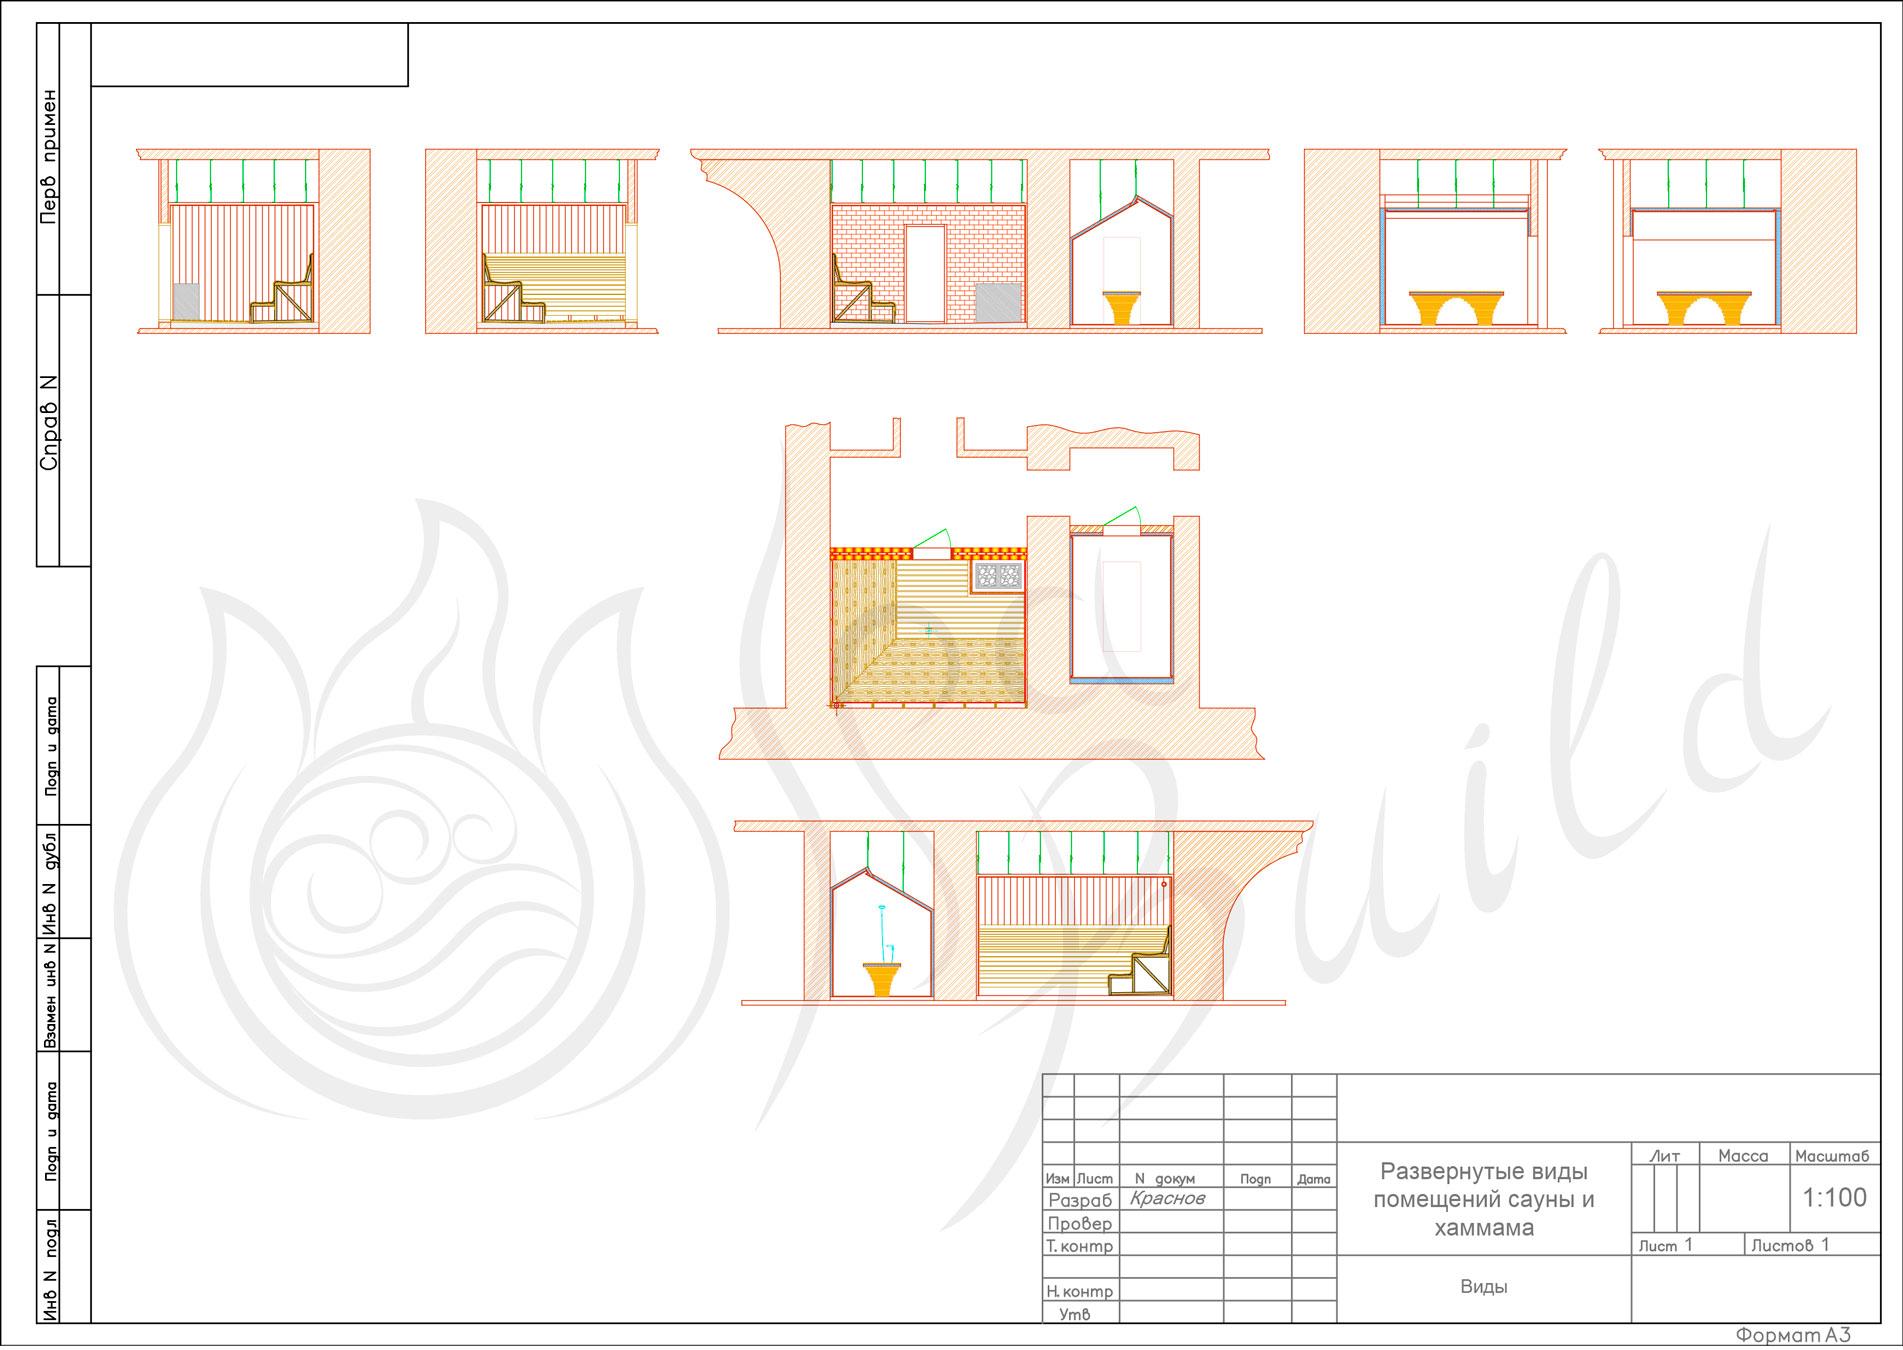 Схемы и проекты саун и бань